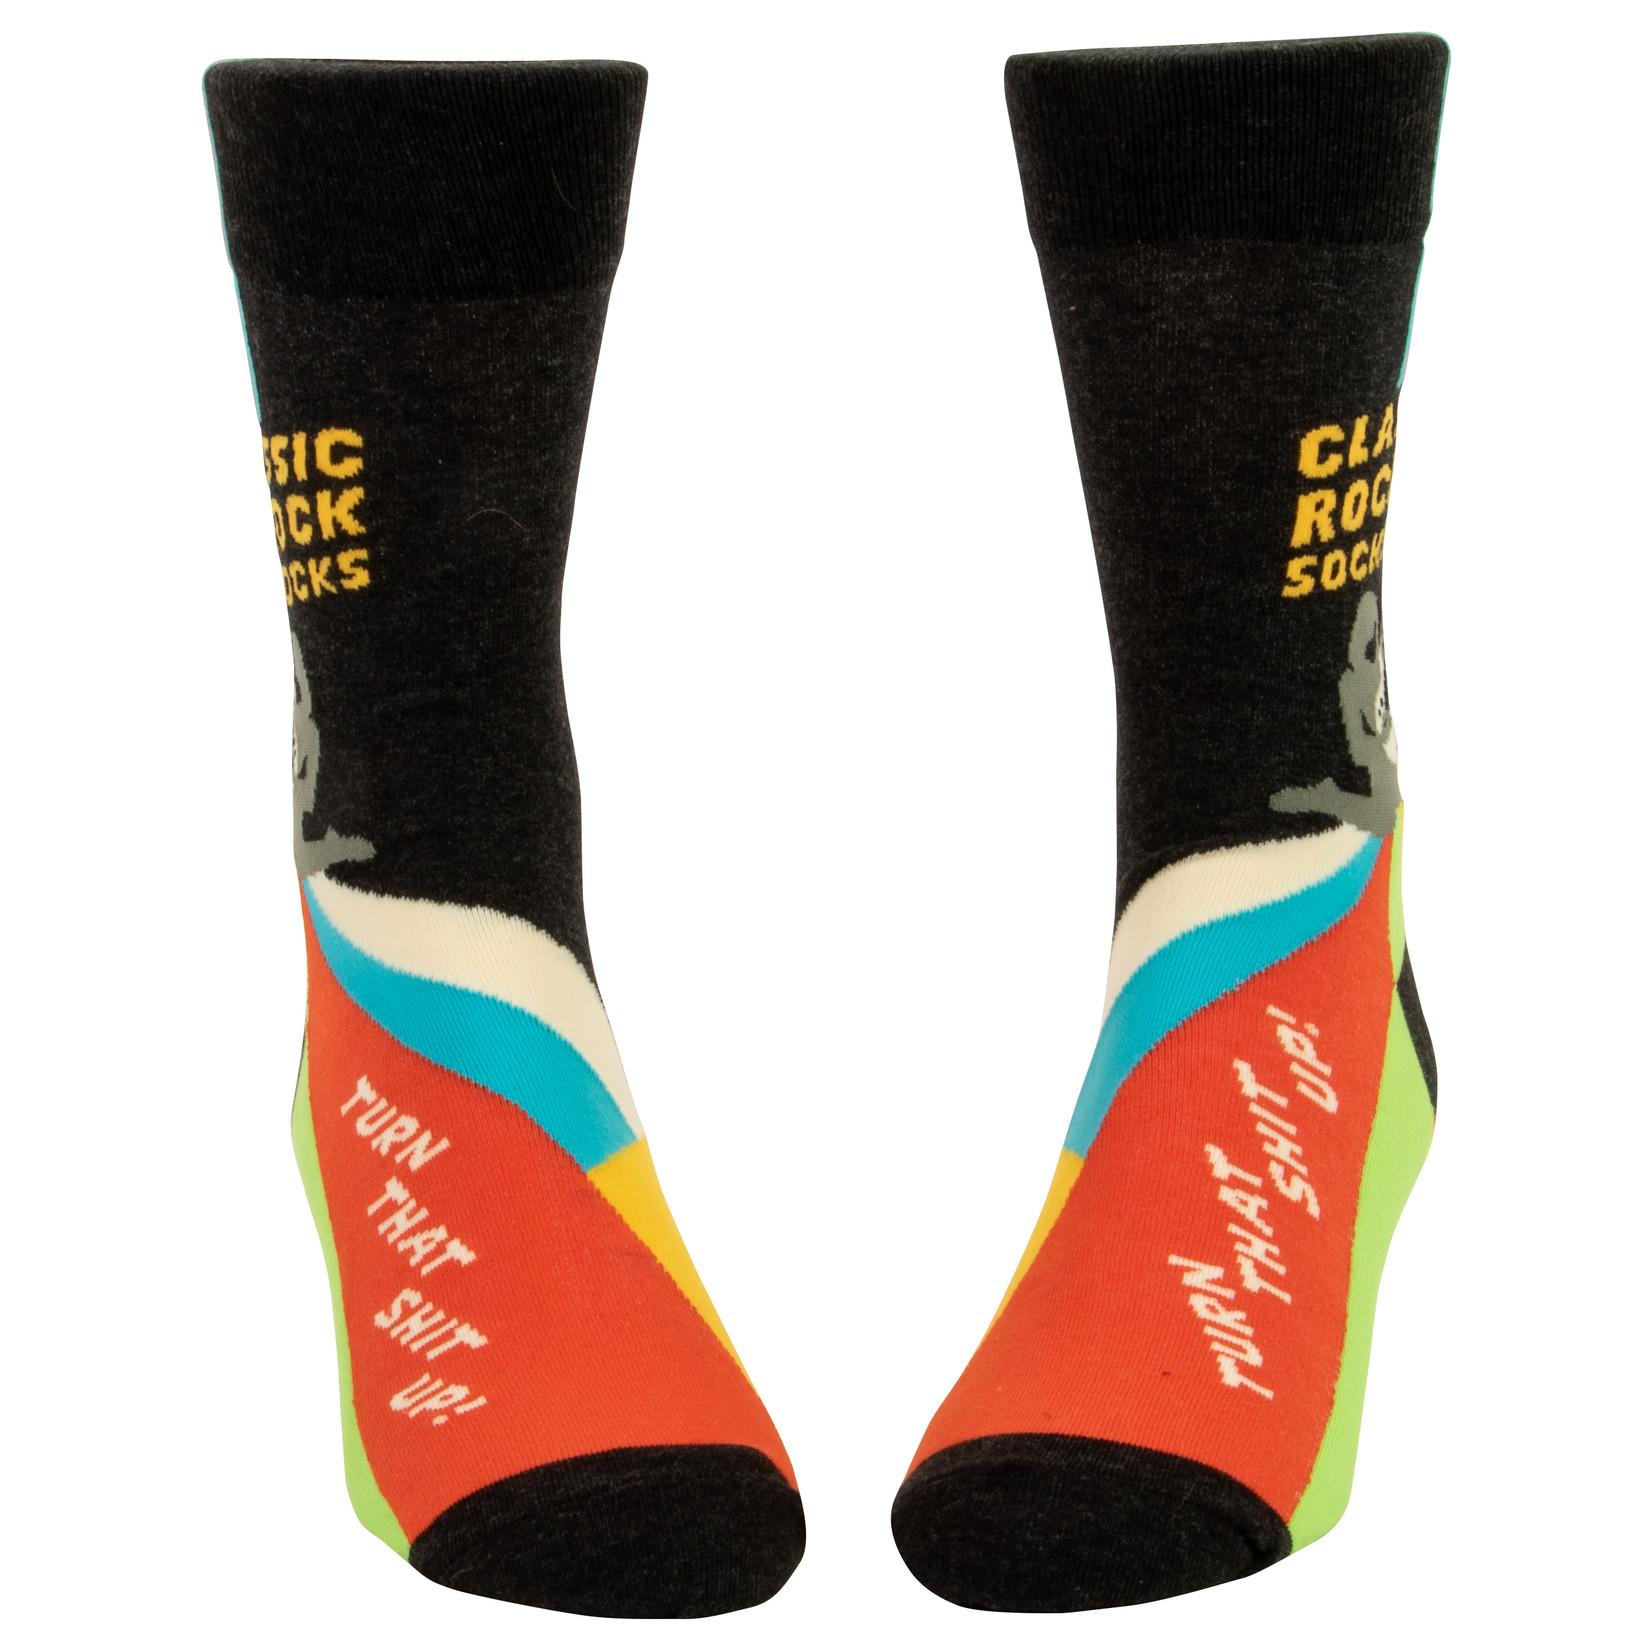 Blue Q Classic Rock Socks M - Crew Sock